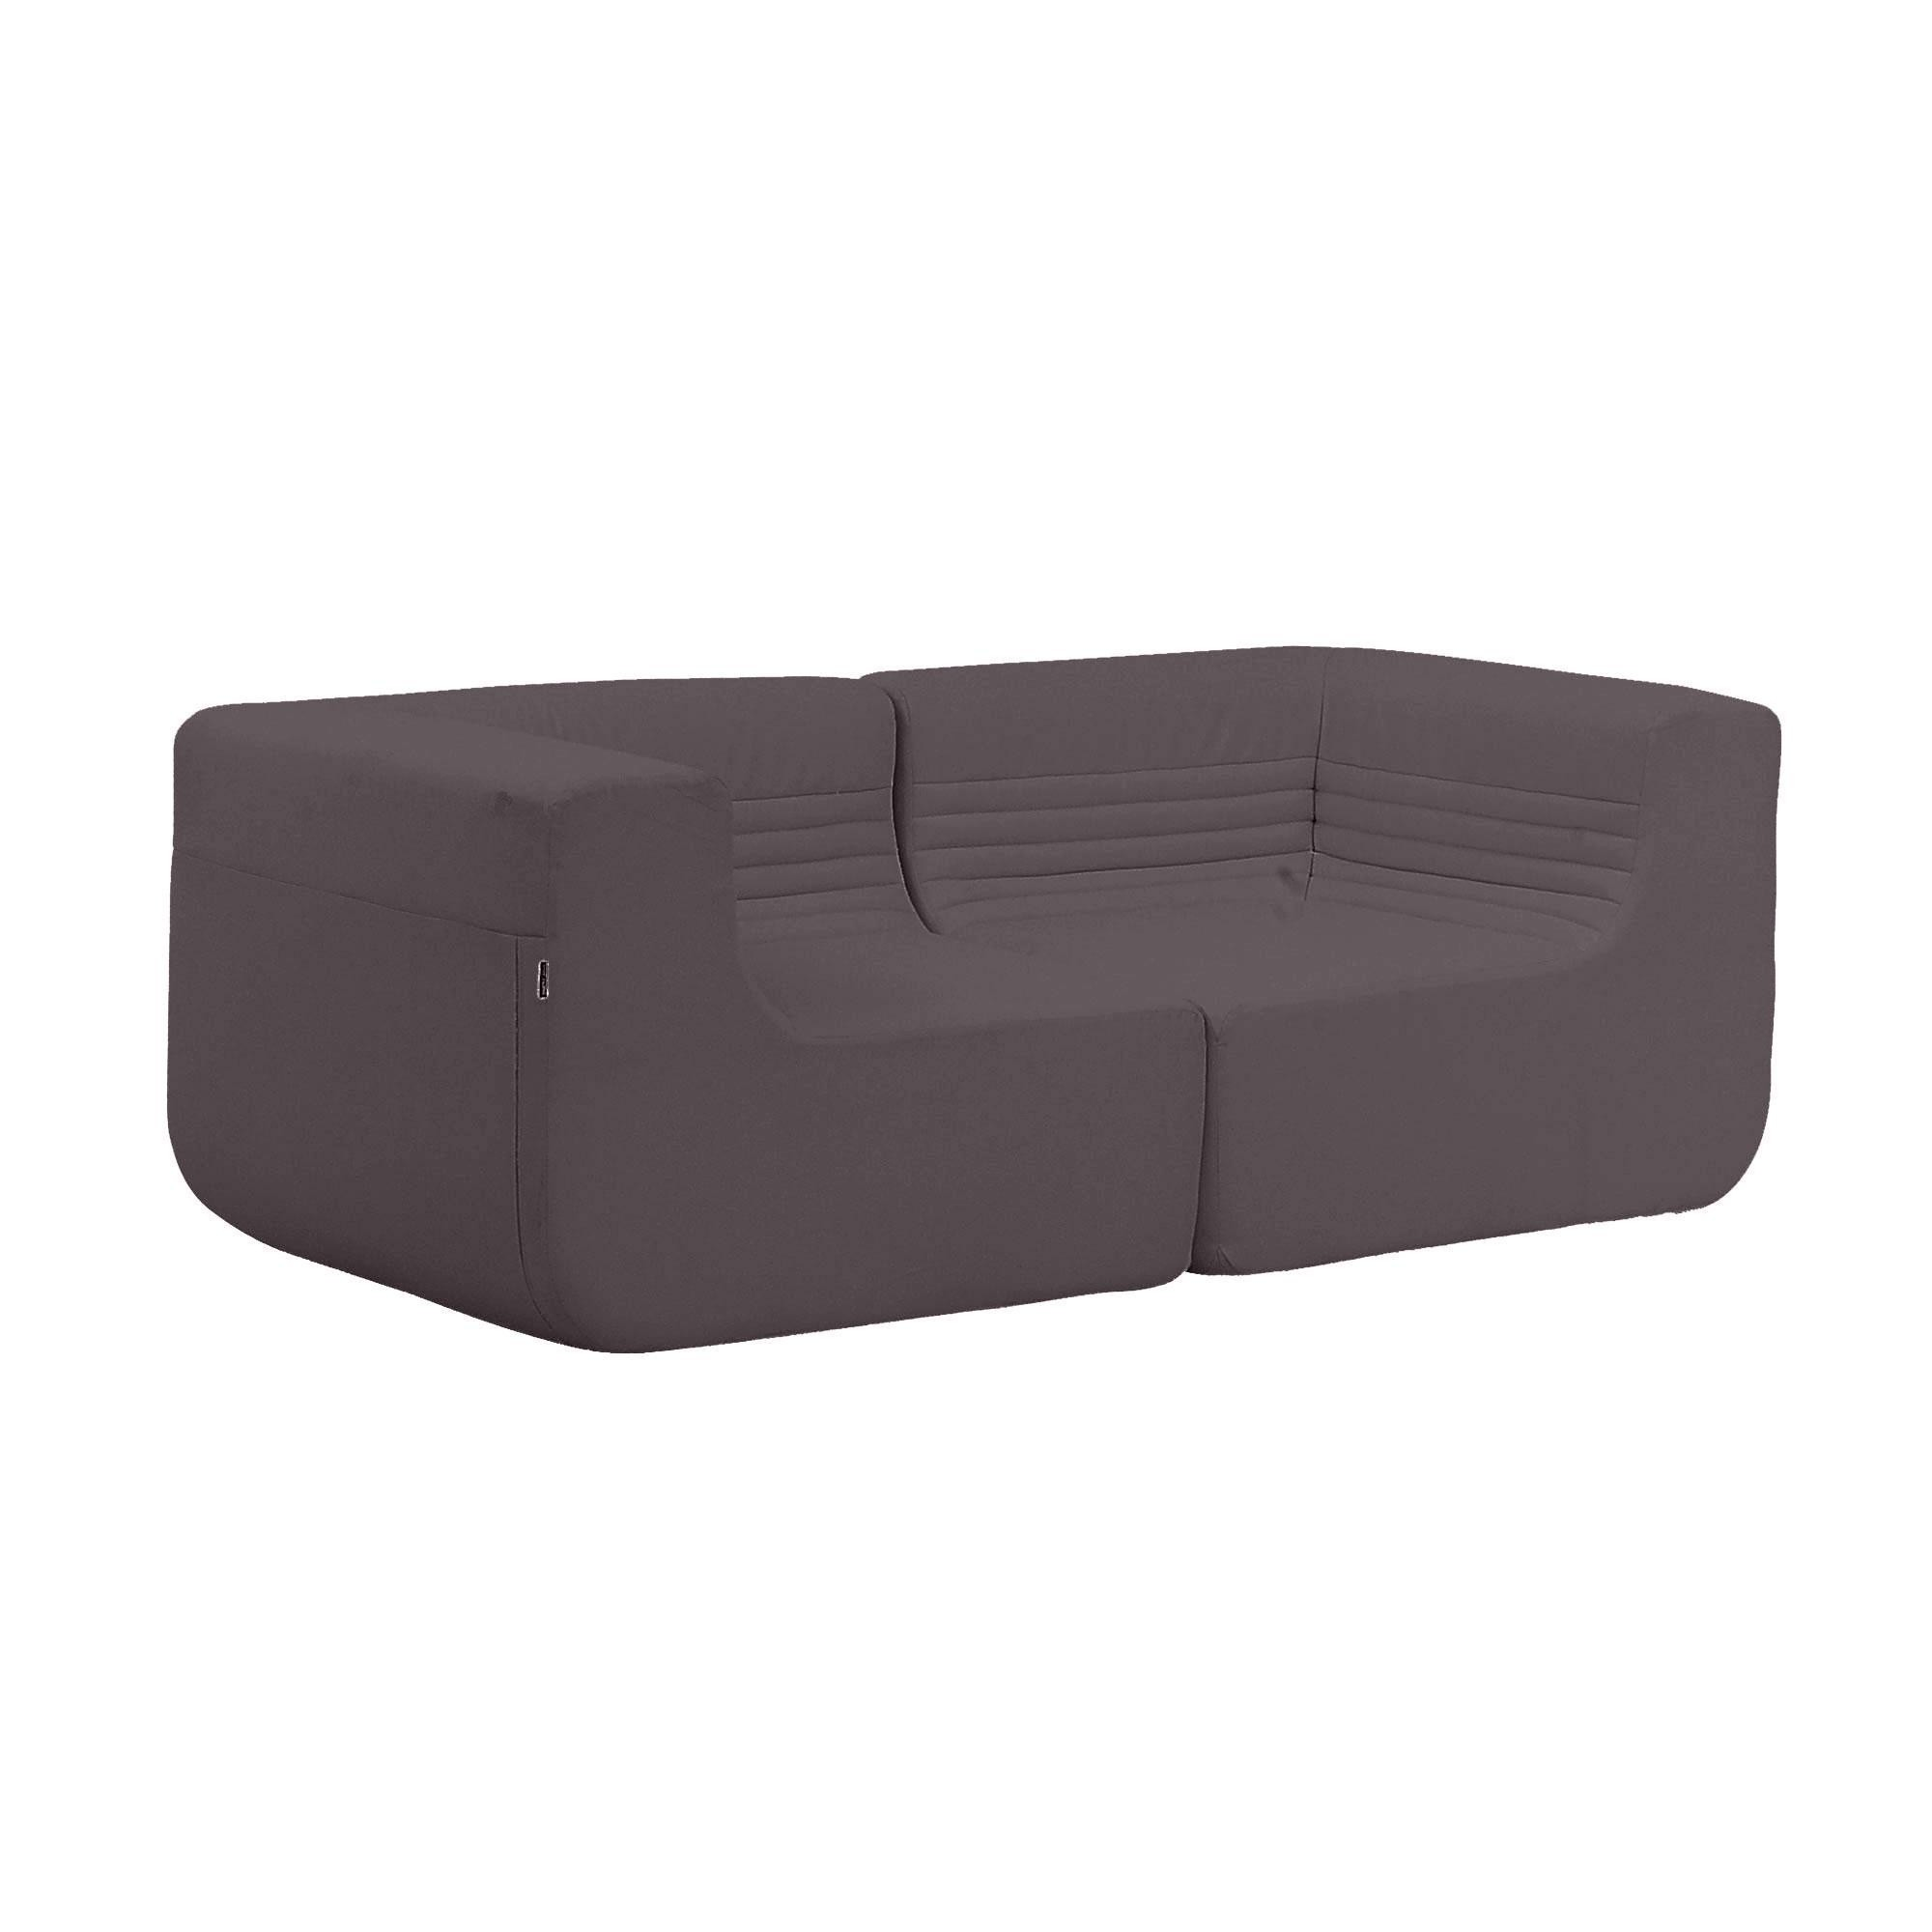 softline loft outdoor sofa braun grau stoff tempo 279 bxhxt 176x63x88cm